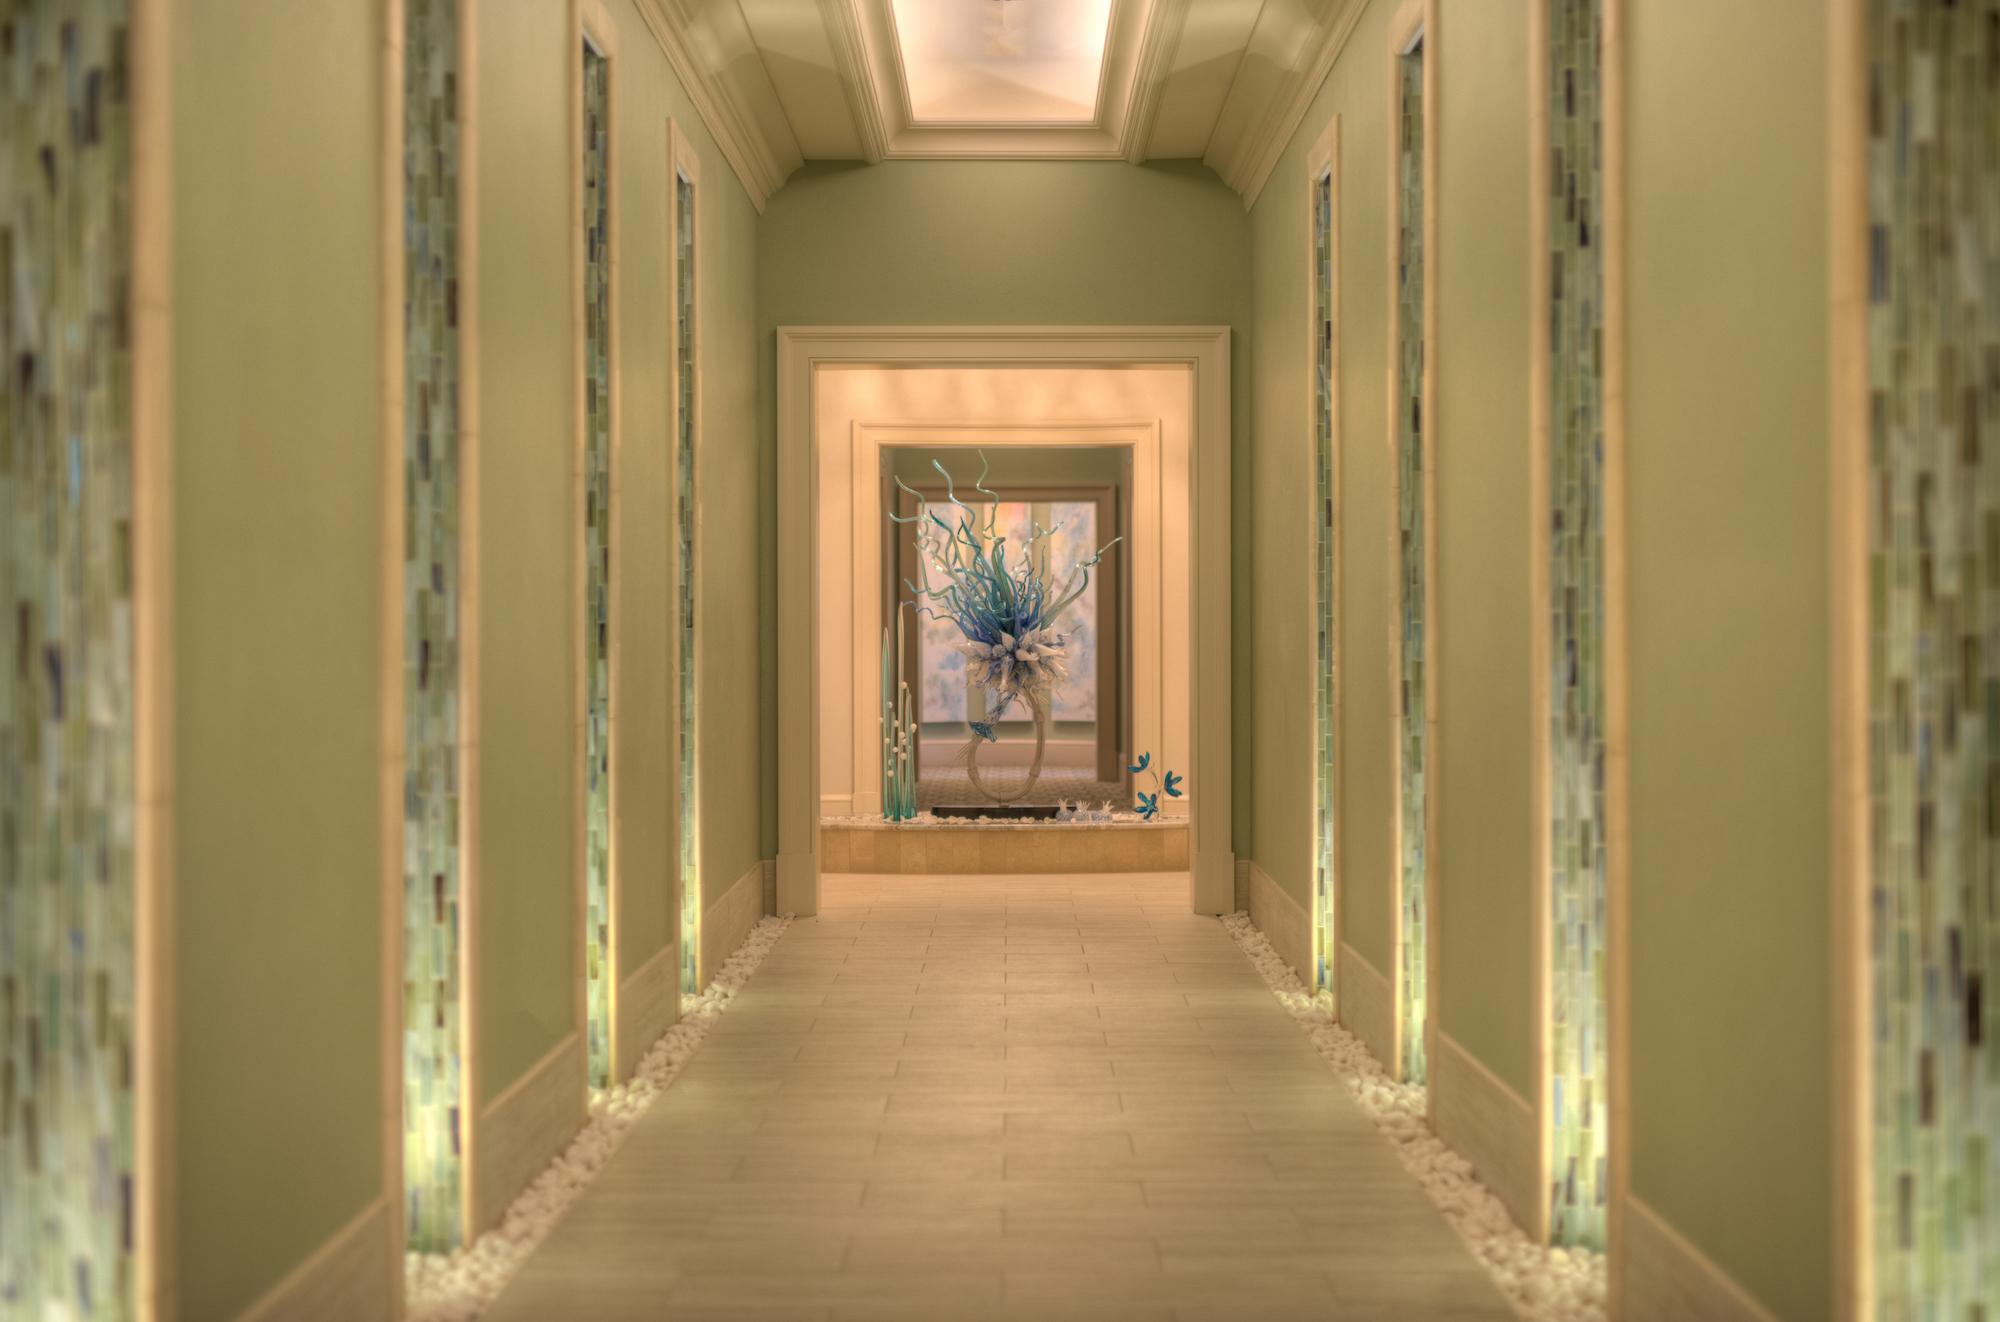 spa hallway towards artwork final.jpg